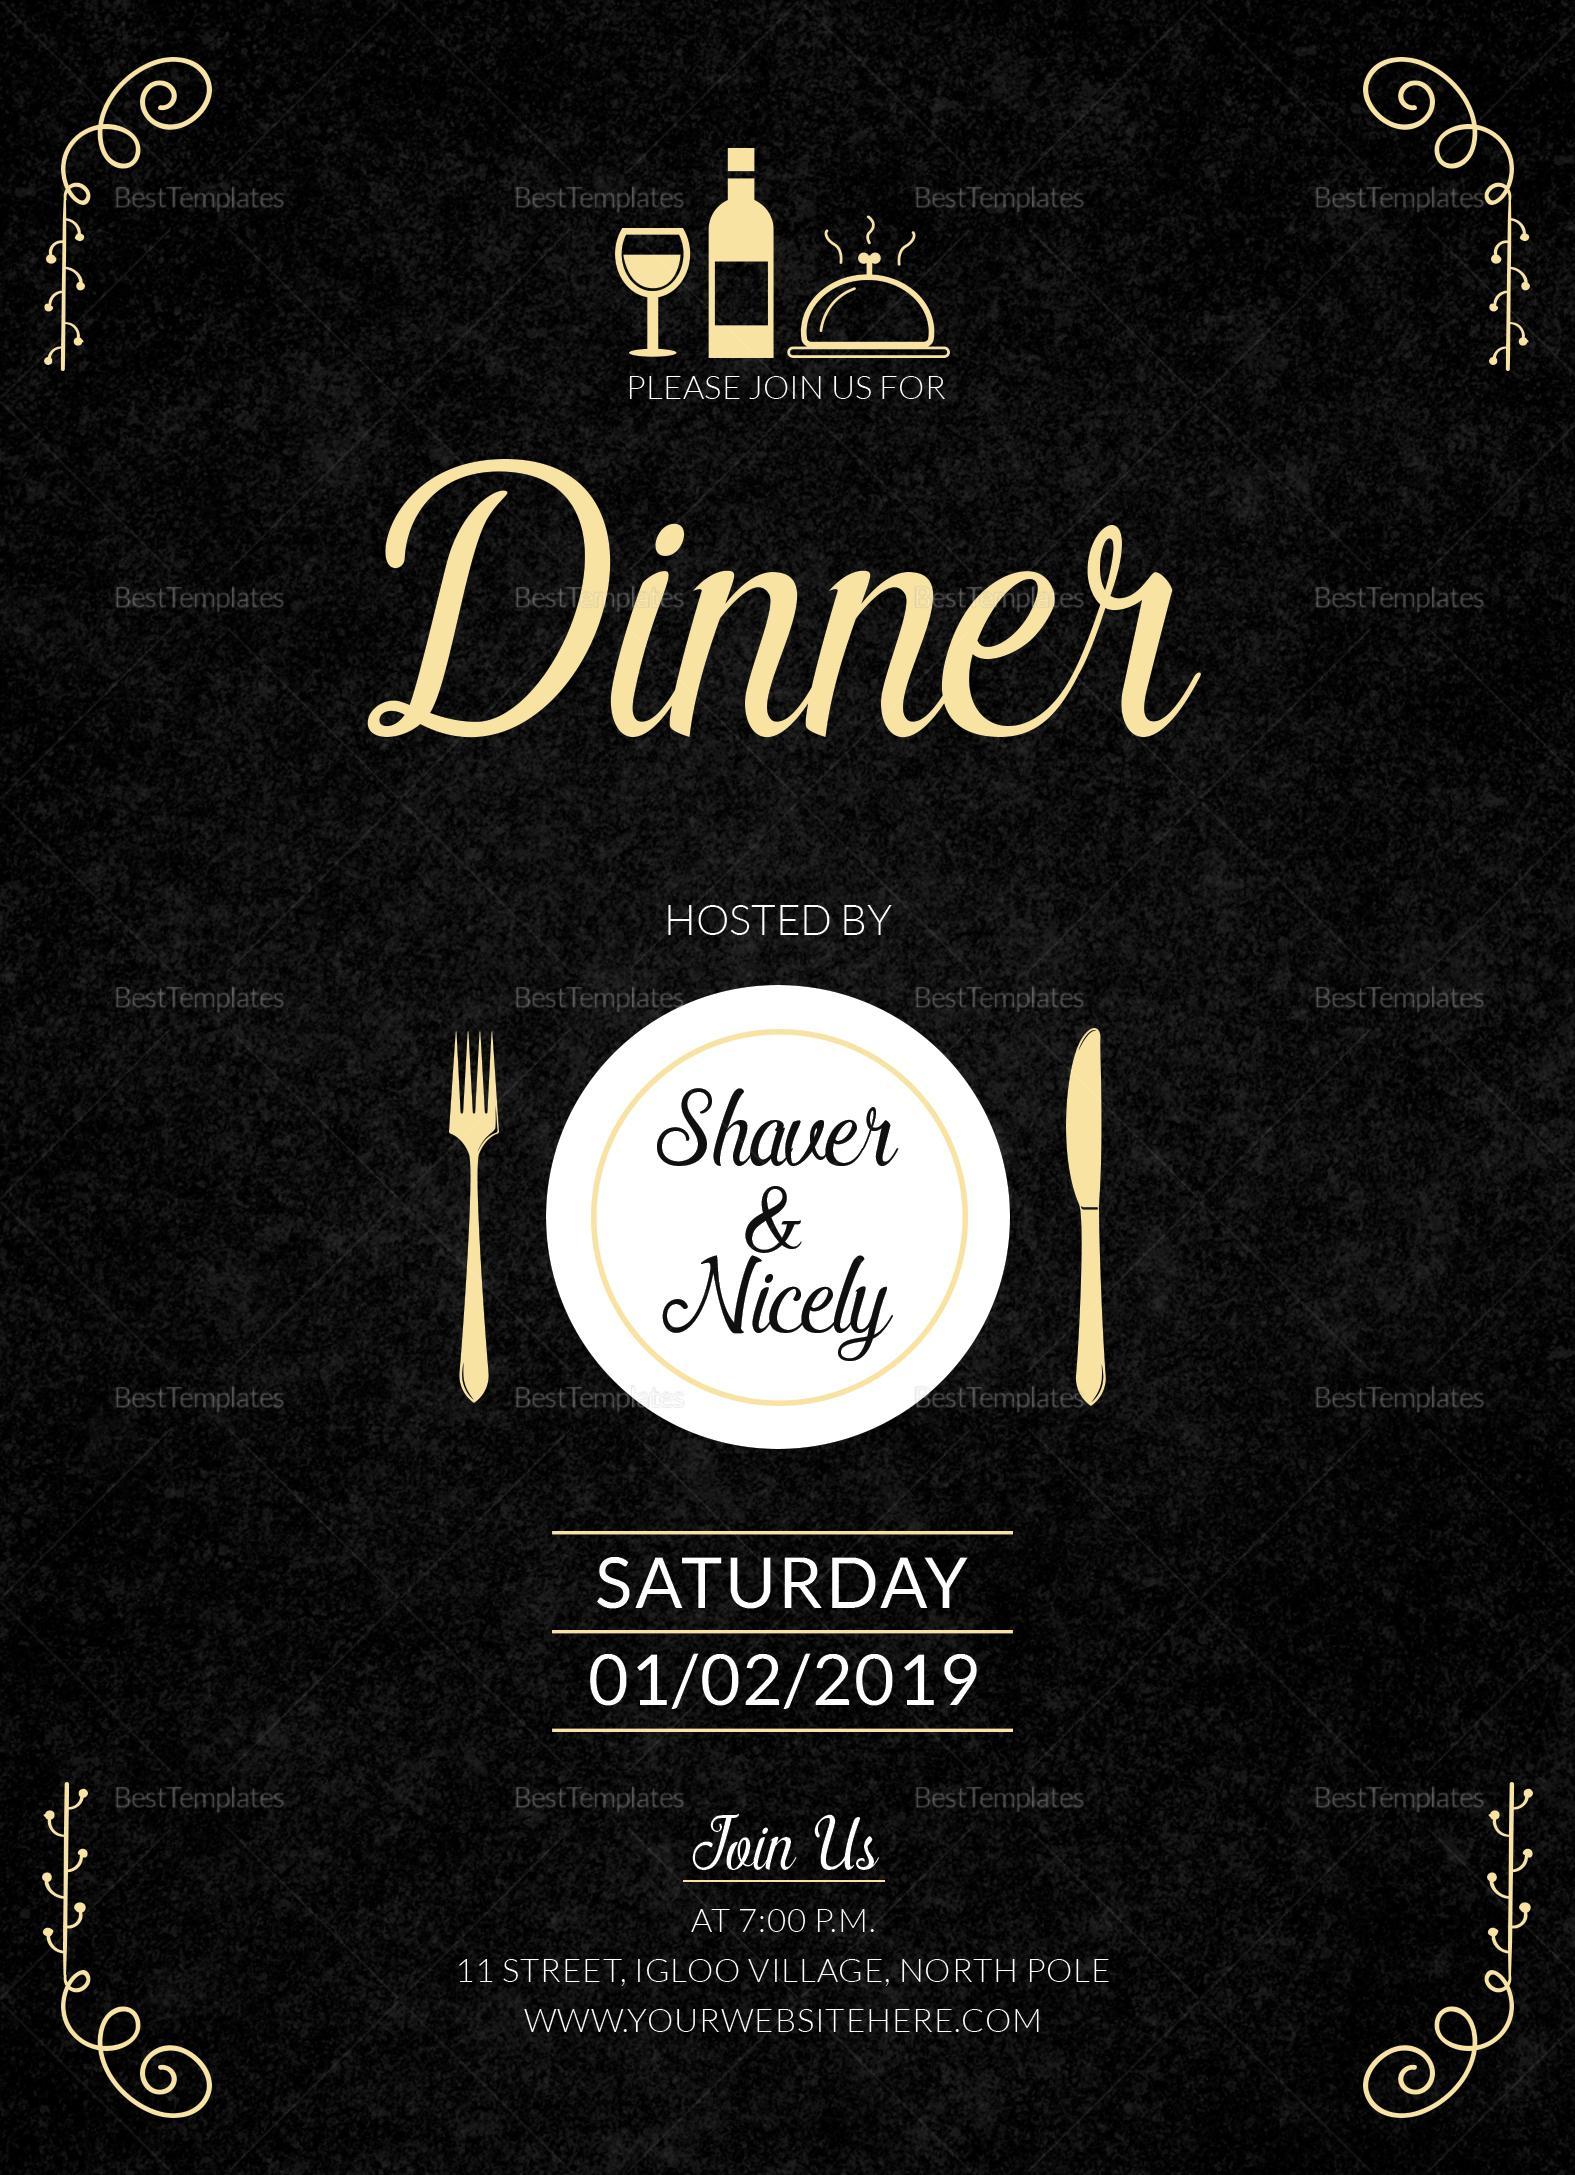 Dinner Invitation Template Publisher